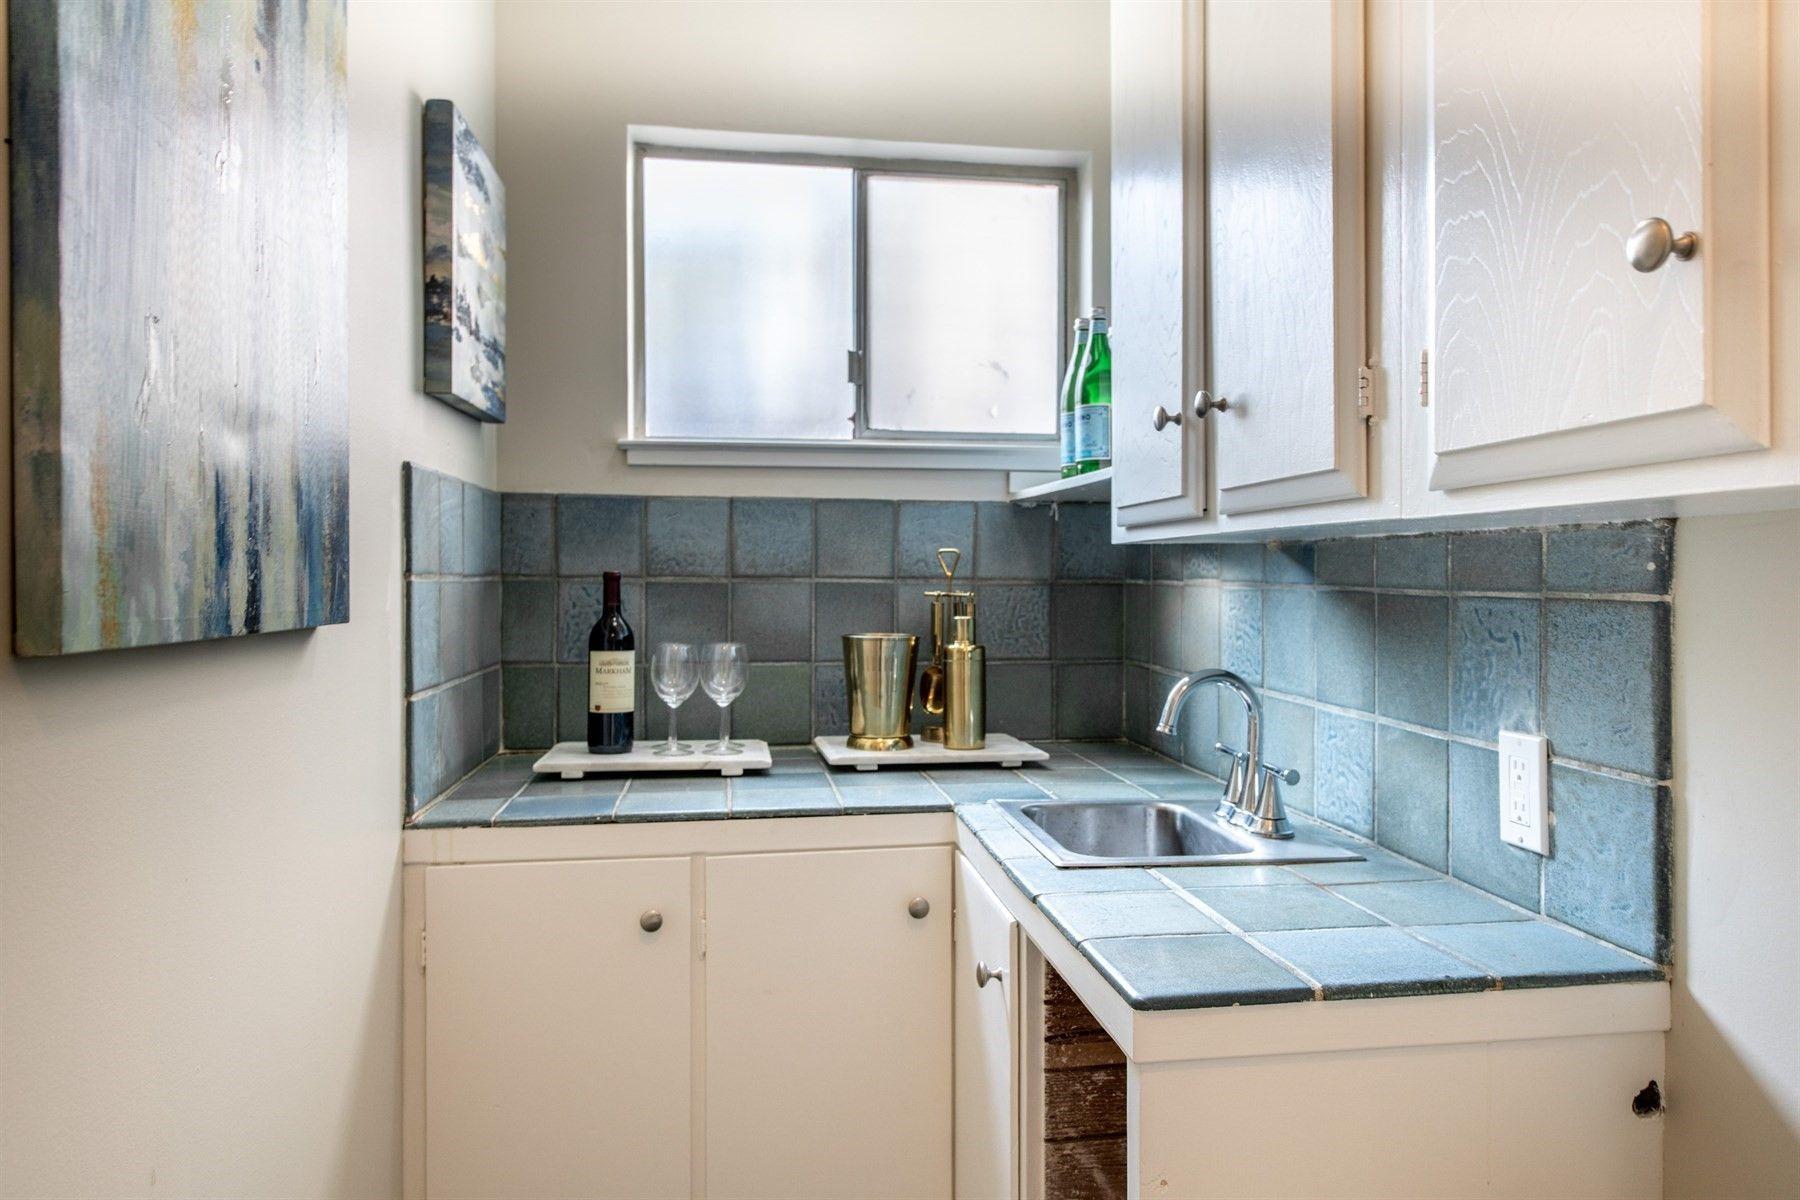 779 Sequoia Ave San Mateo Ca 94403 Kitchen Cabinets Home Decor San Mateo